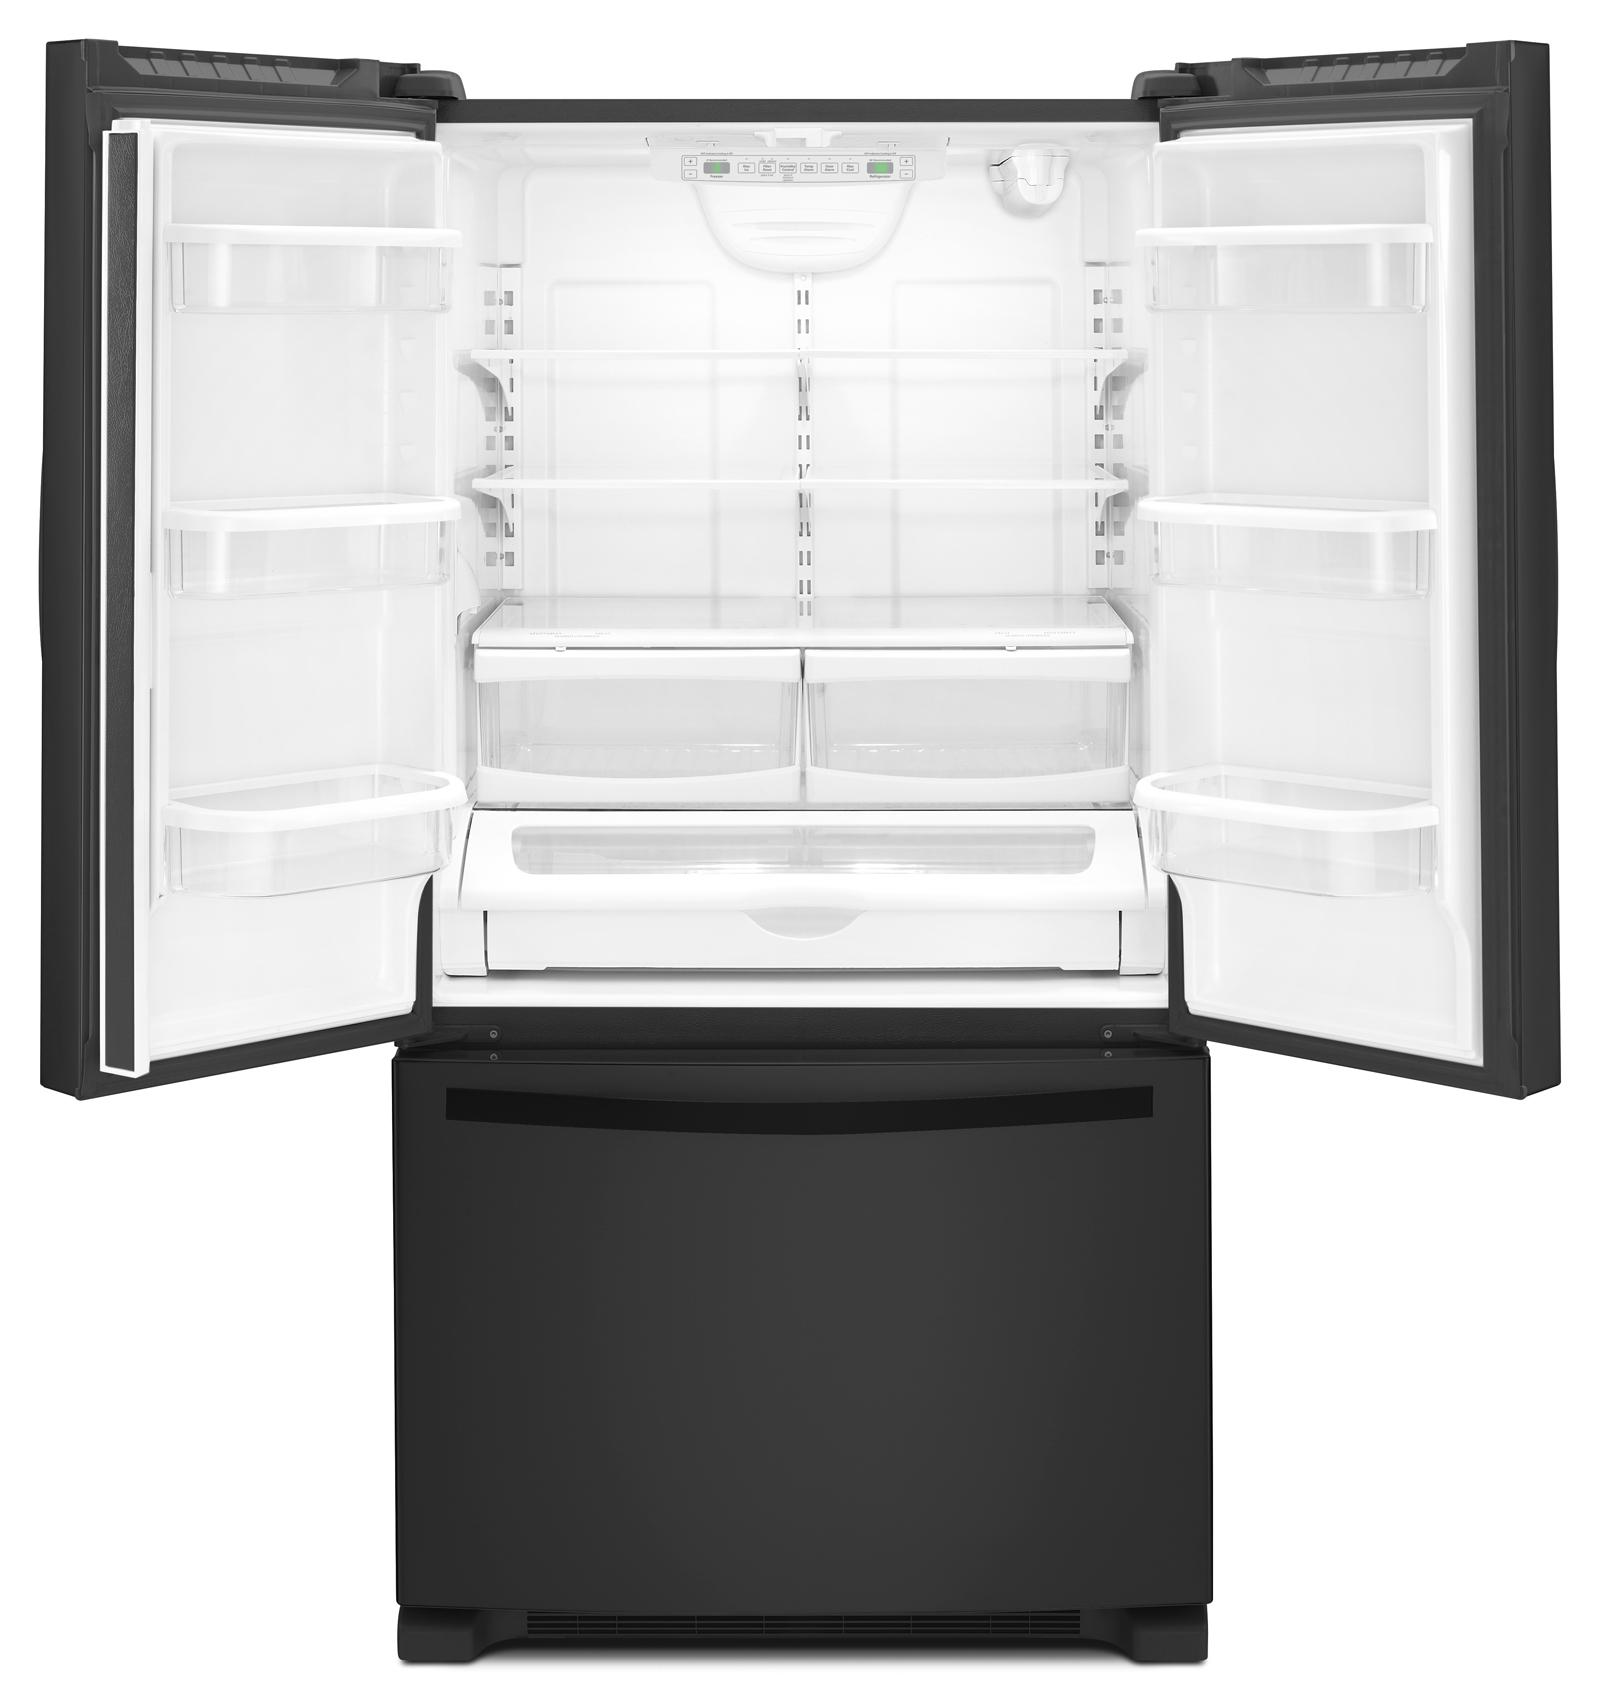 Whirlpool WRF540CWBB 20 cu. ft. Counter-Depth French Door Refrigerator w/ Interior Water Dispenser - Black